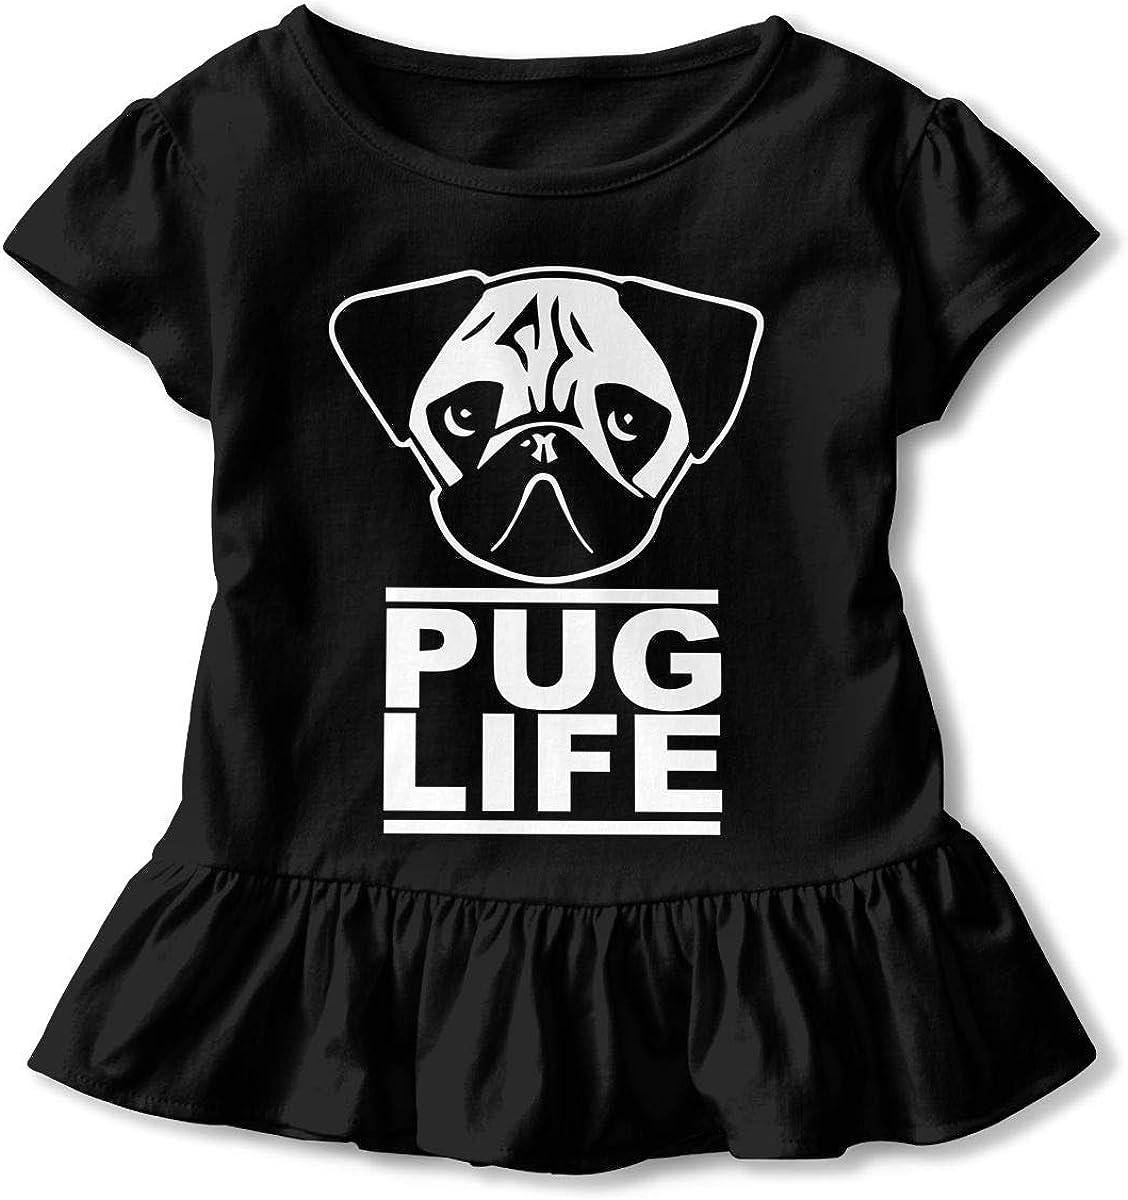 Pug Life Child Short-Sleeved Tee Tops